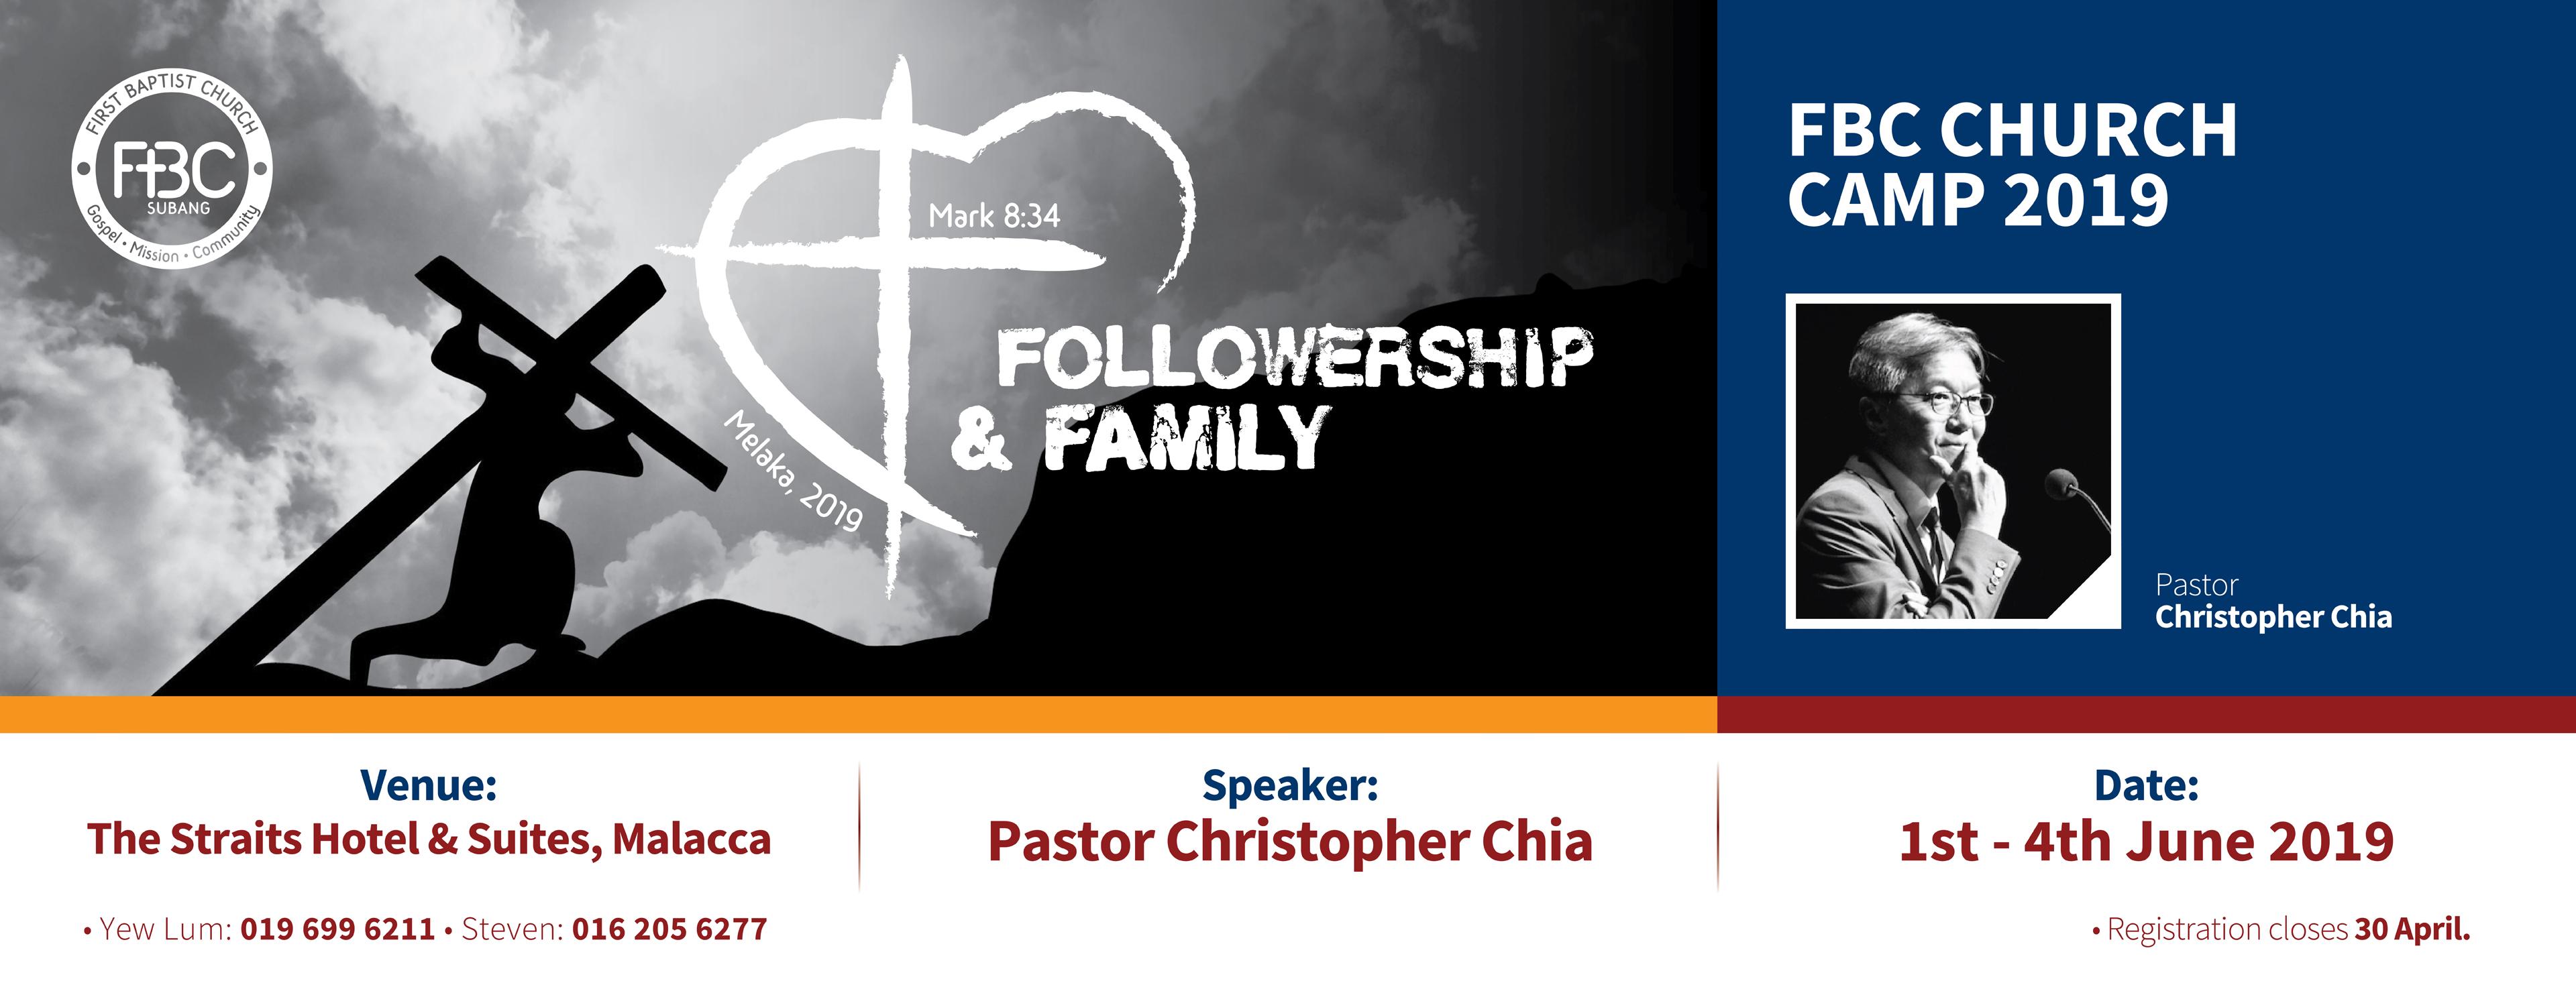 FBC-Church-Camp-2019-Web-Banner